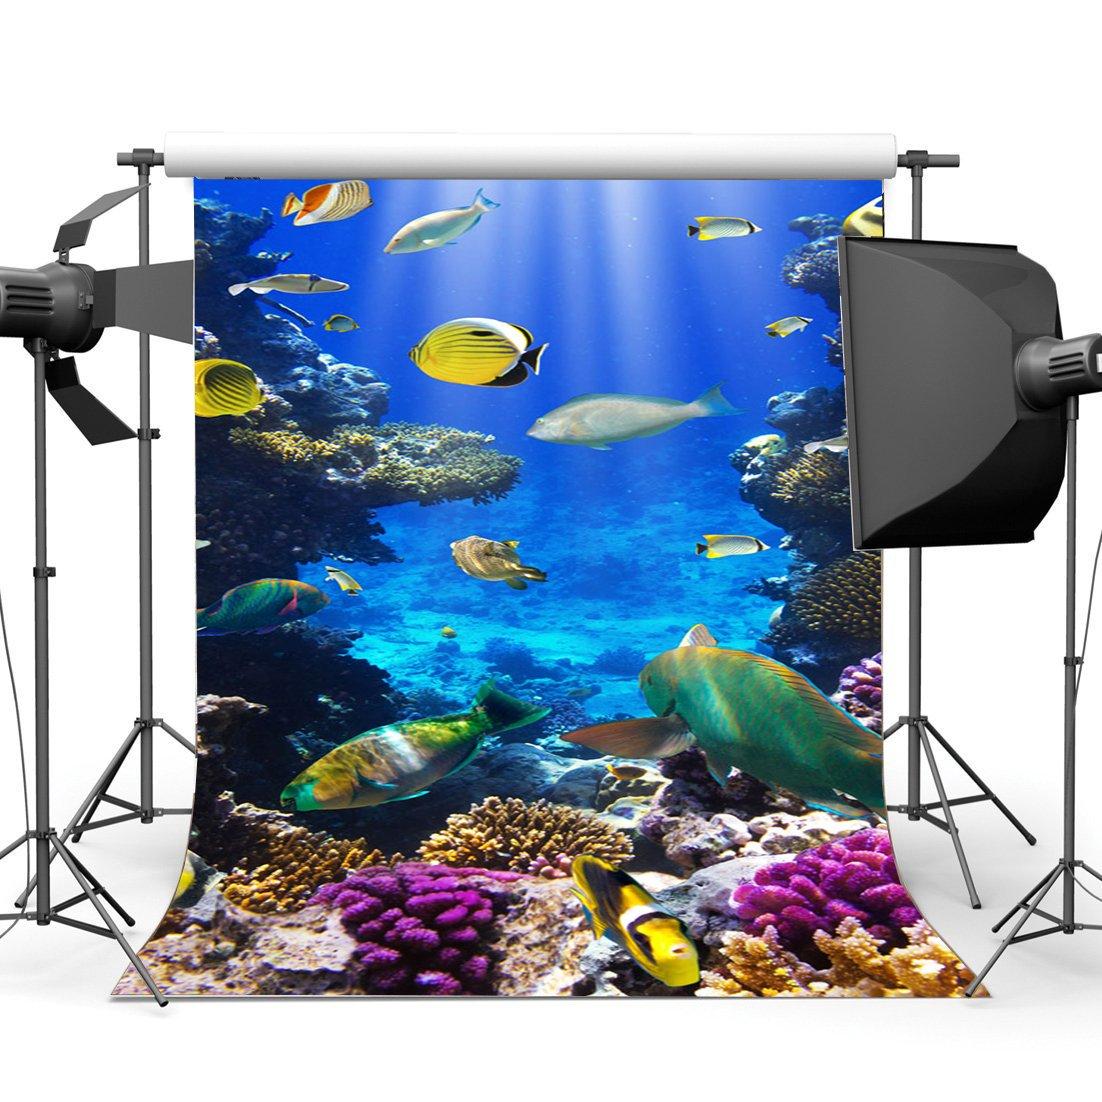 Gladbuy ビニール 5 x 7フィート 水中 世界 背景 水族館 背景 ファンシー コーラル 魚 ライト レイ バブル 海 世界 写真 背景 子供 大人 夏 海 セーリング 写真 スタジオ 小道具 KX370   B07B8LHFBD